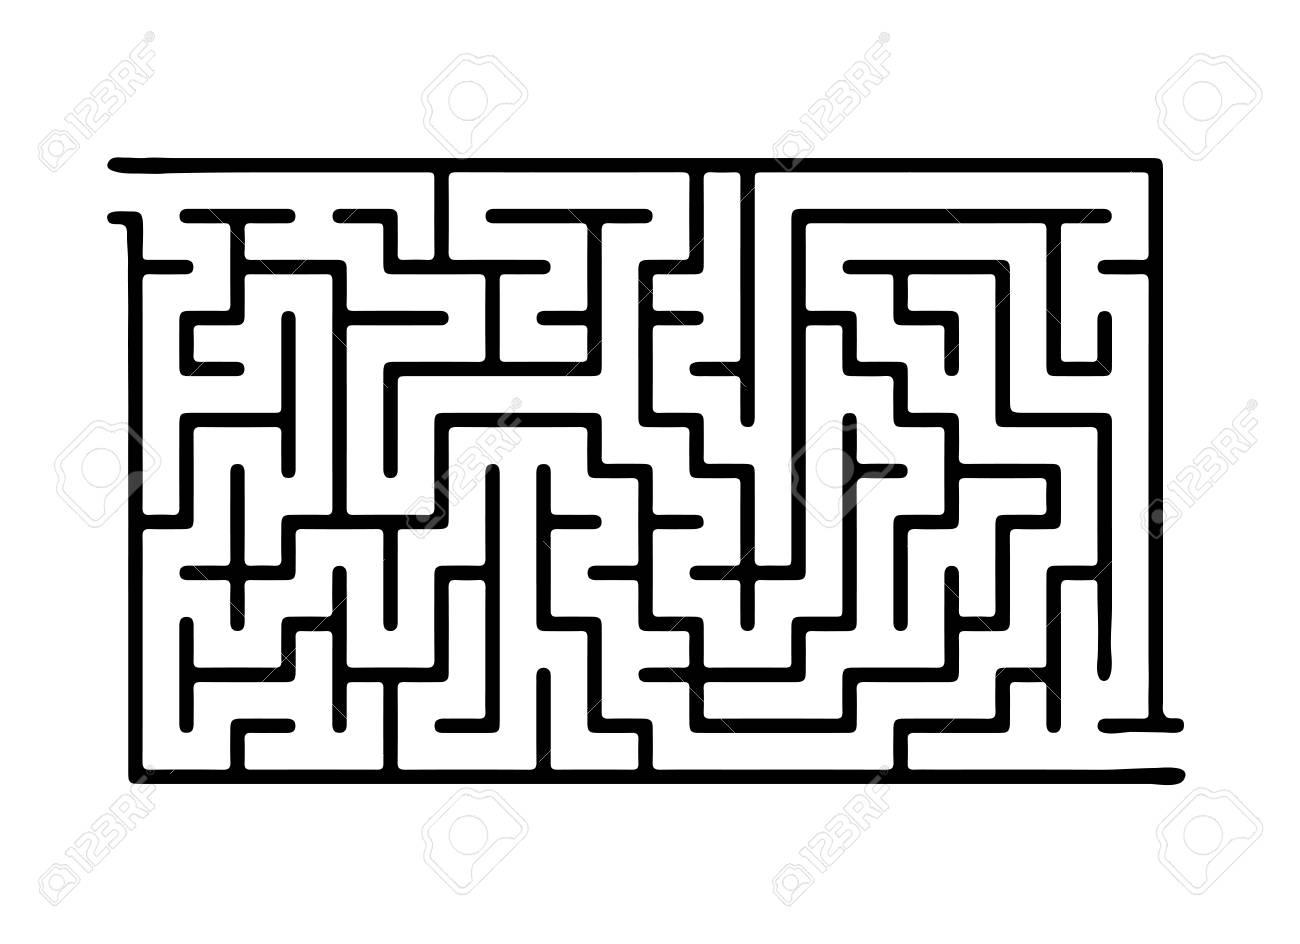 Black vector maze, labyrinth illustration - 43134463